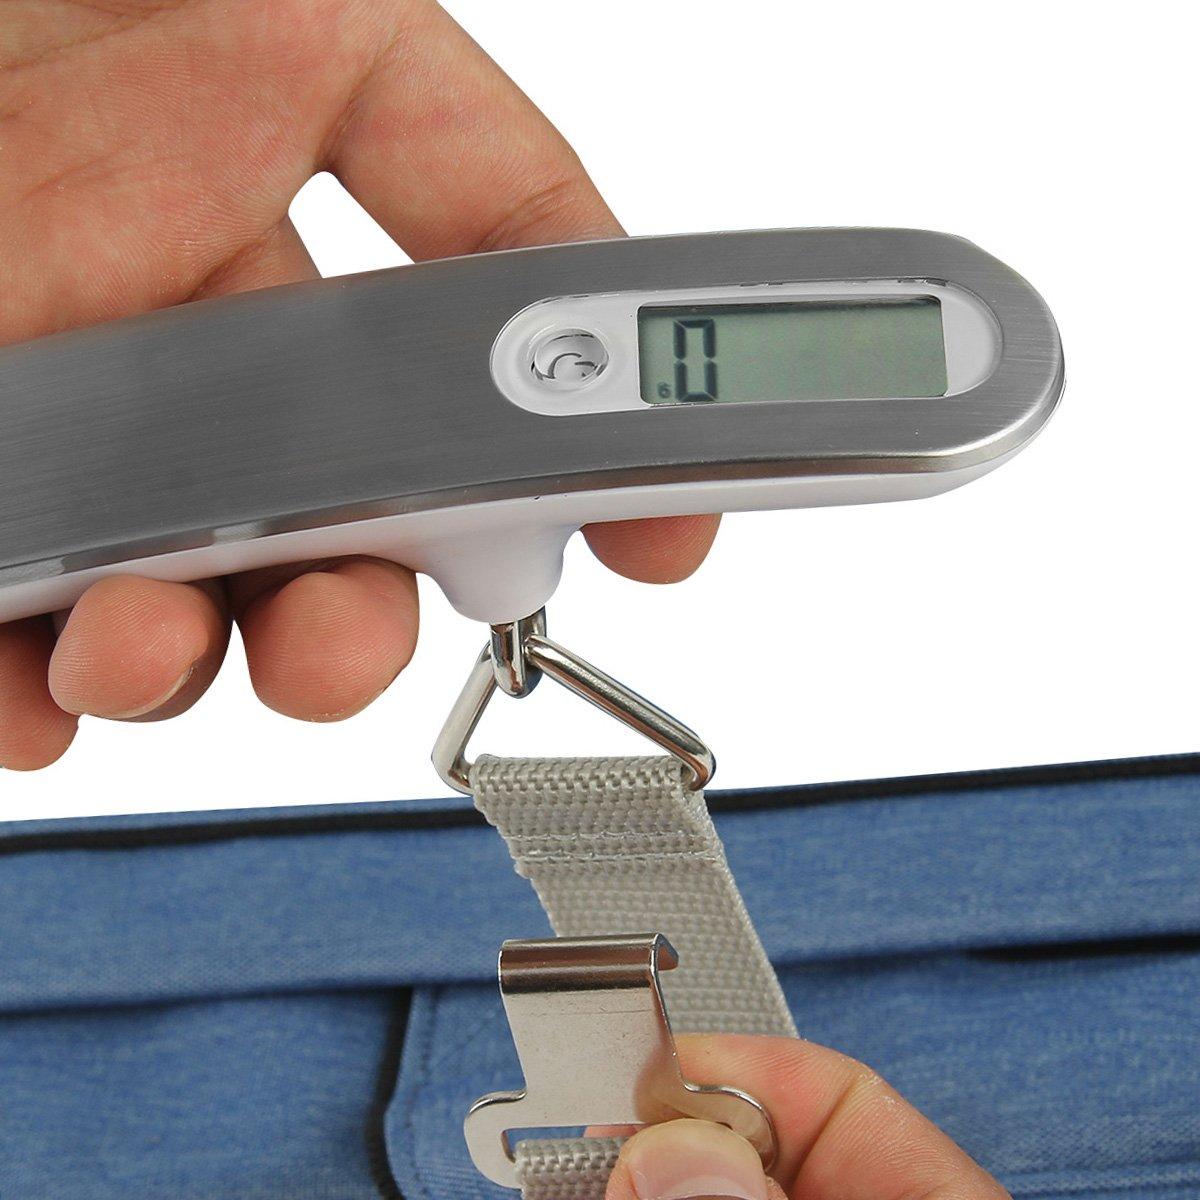 Travel Luggage Scales Pesine Digital Scale 110Ib Hanging weighting scales